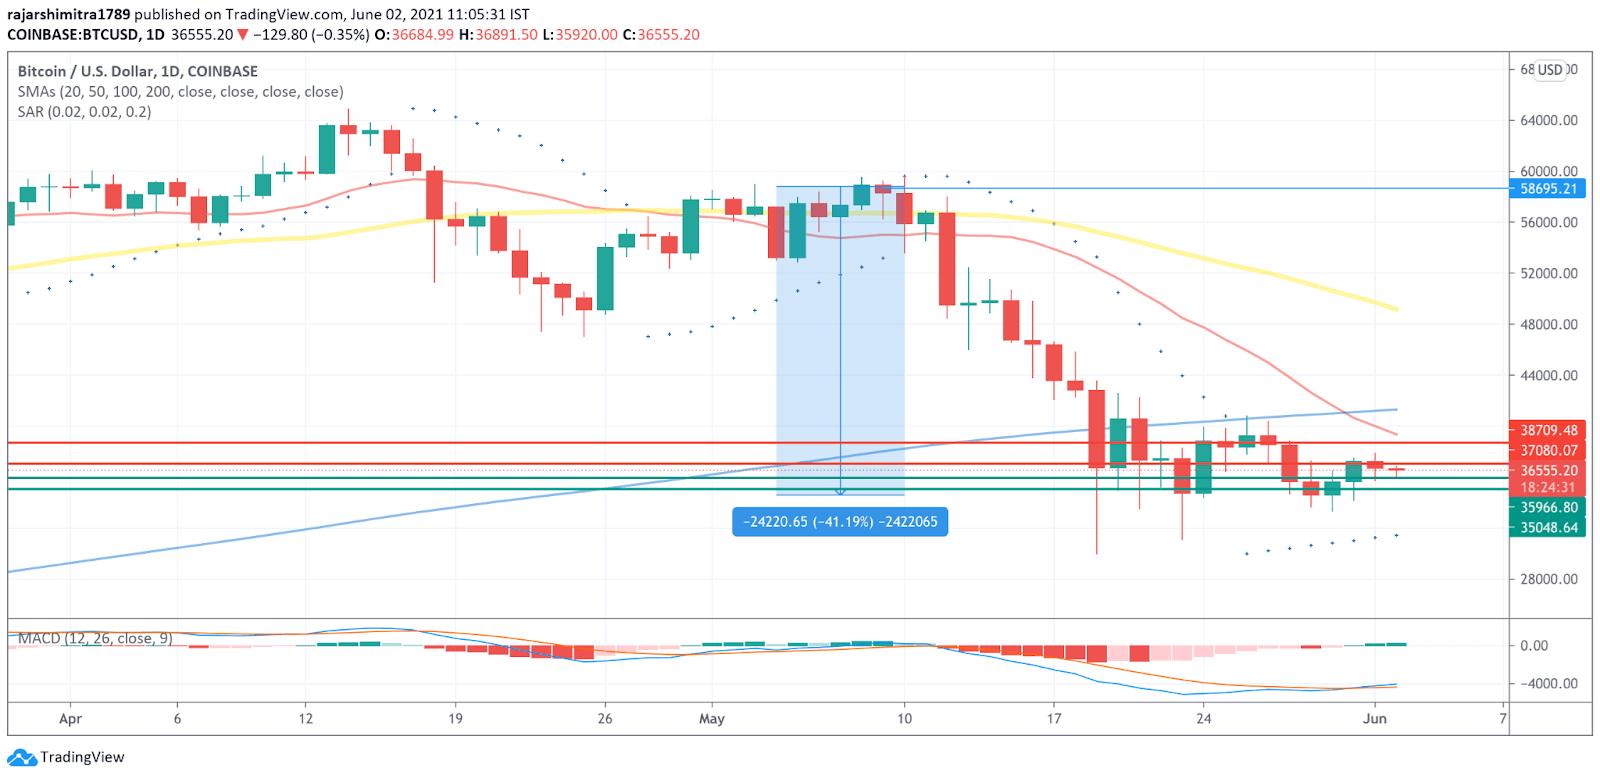 BTC/USD daily chart 060221